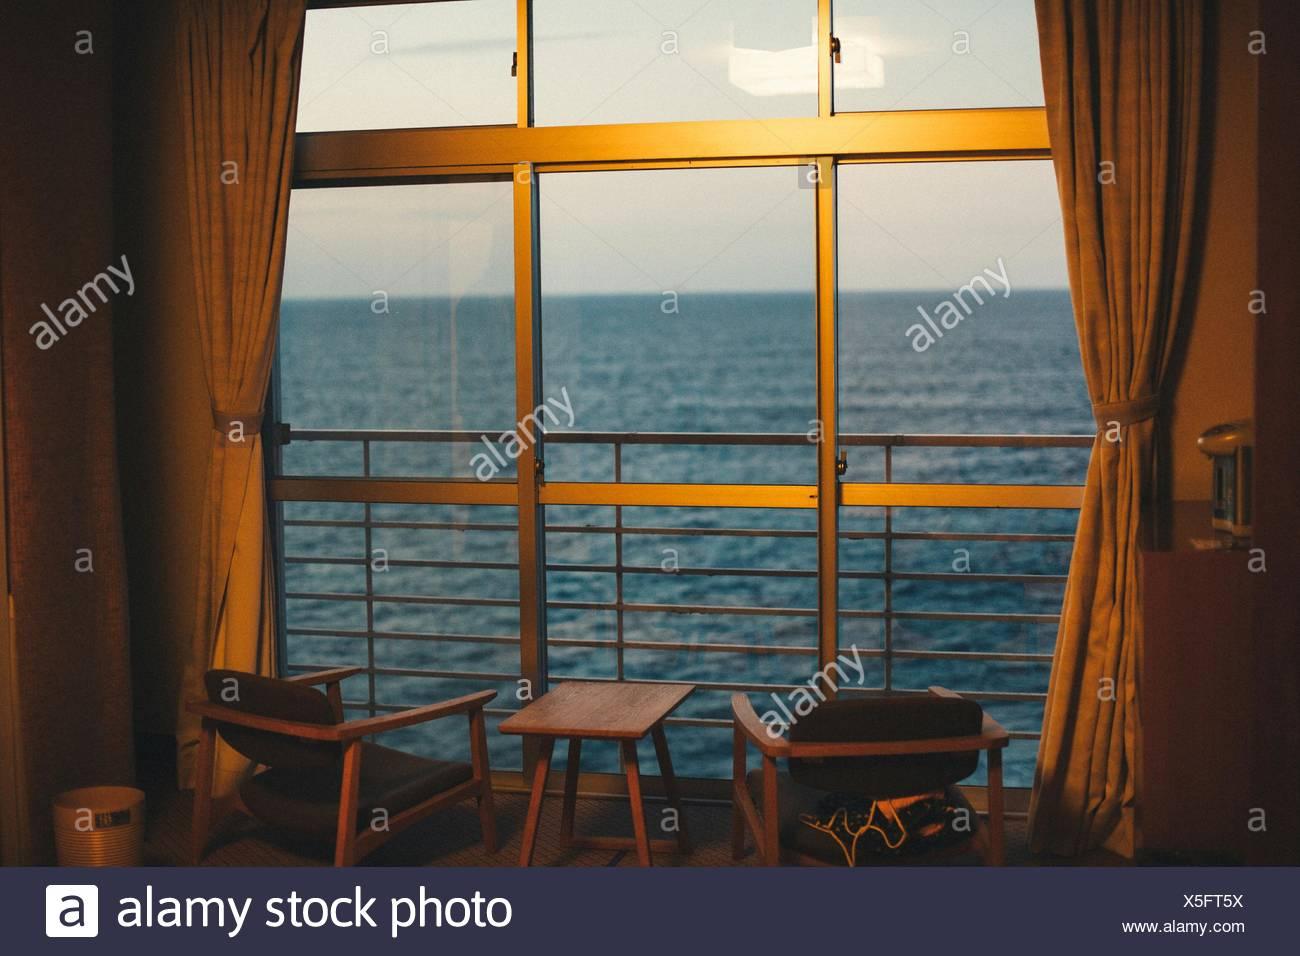 Sea Seen Through Window Of Room - Stock Image